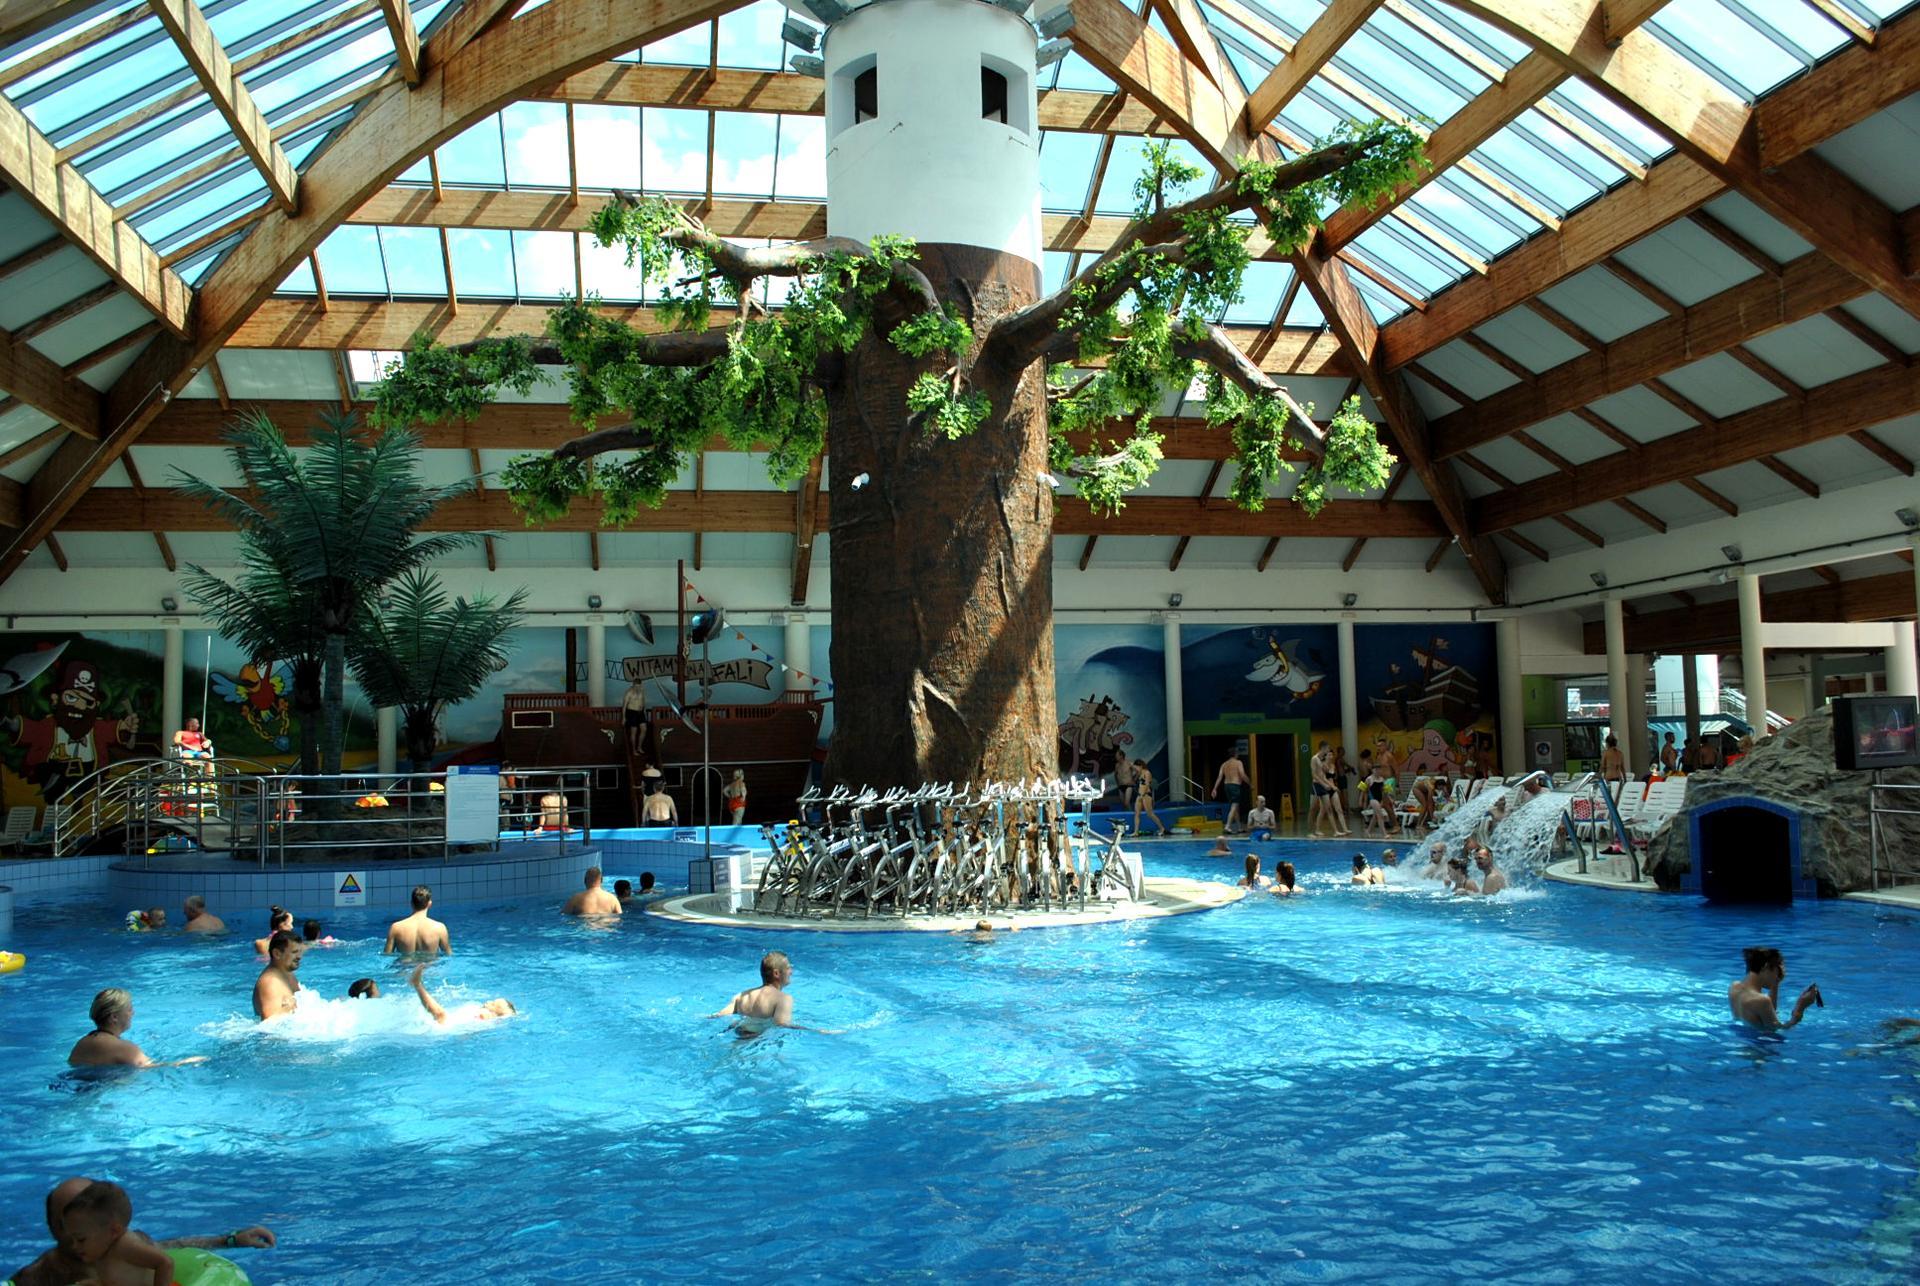 фото аквапарка вена бесплатные обои